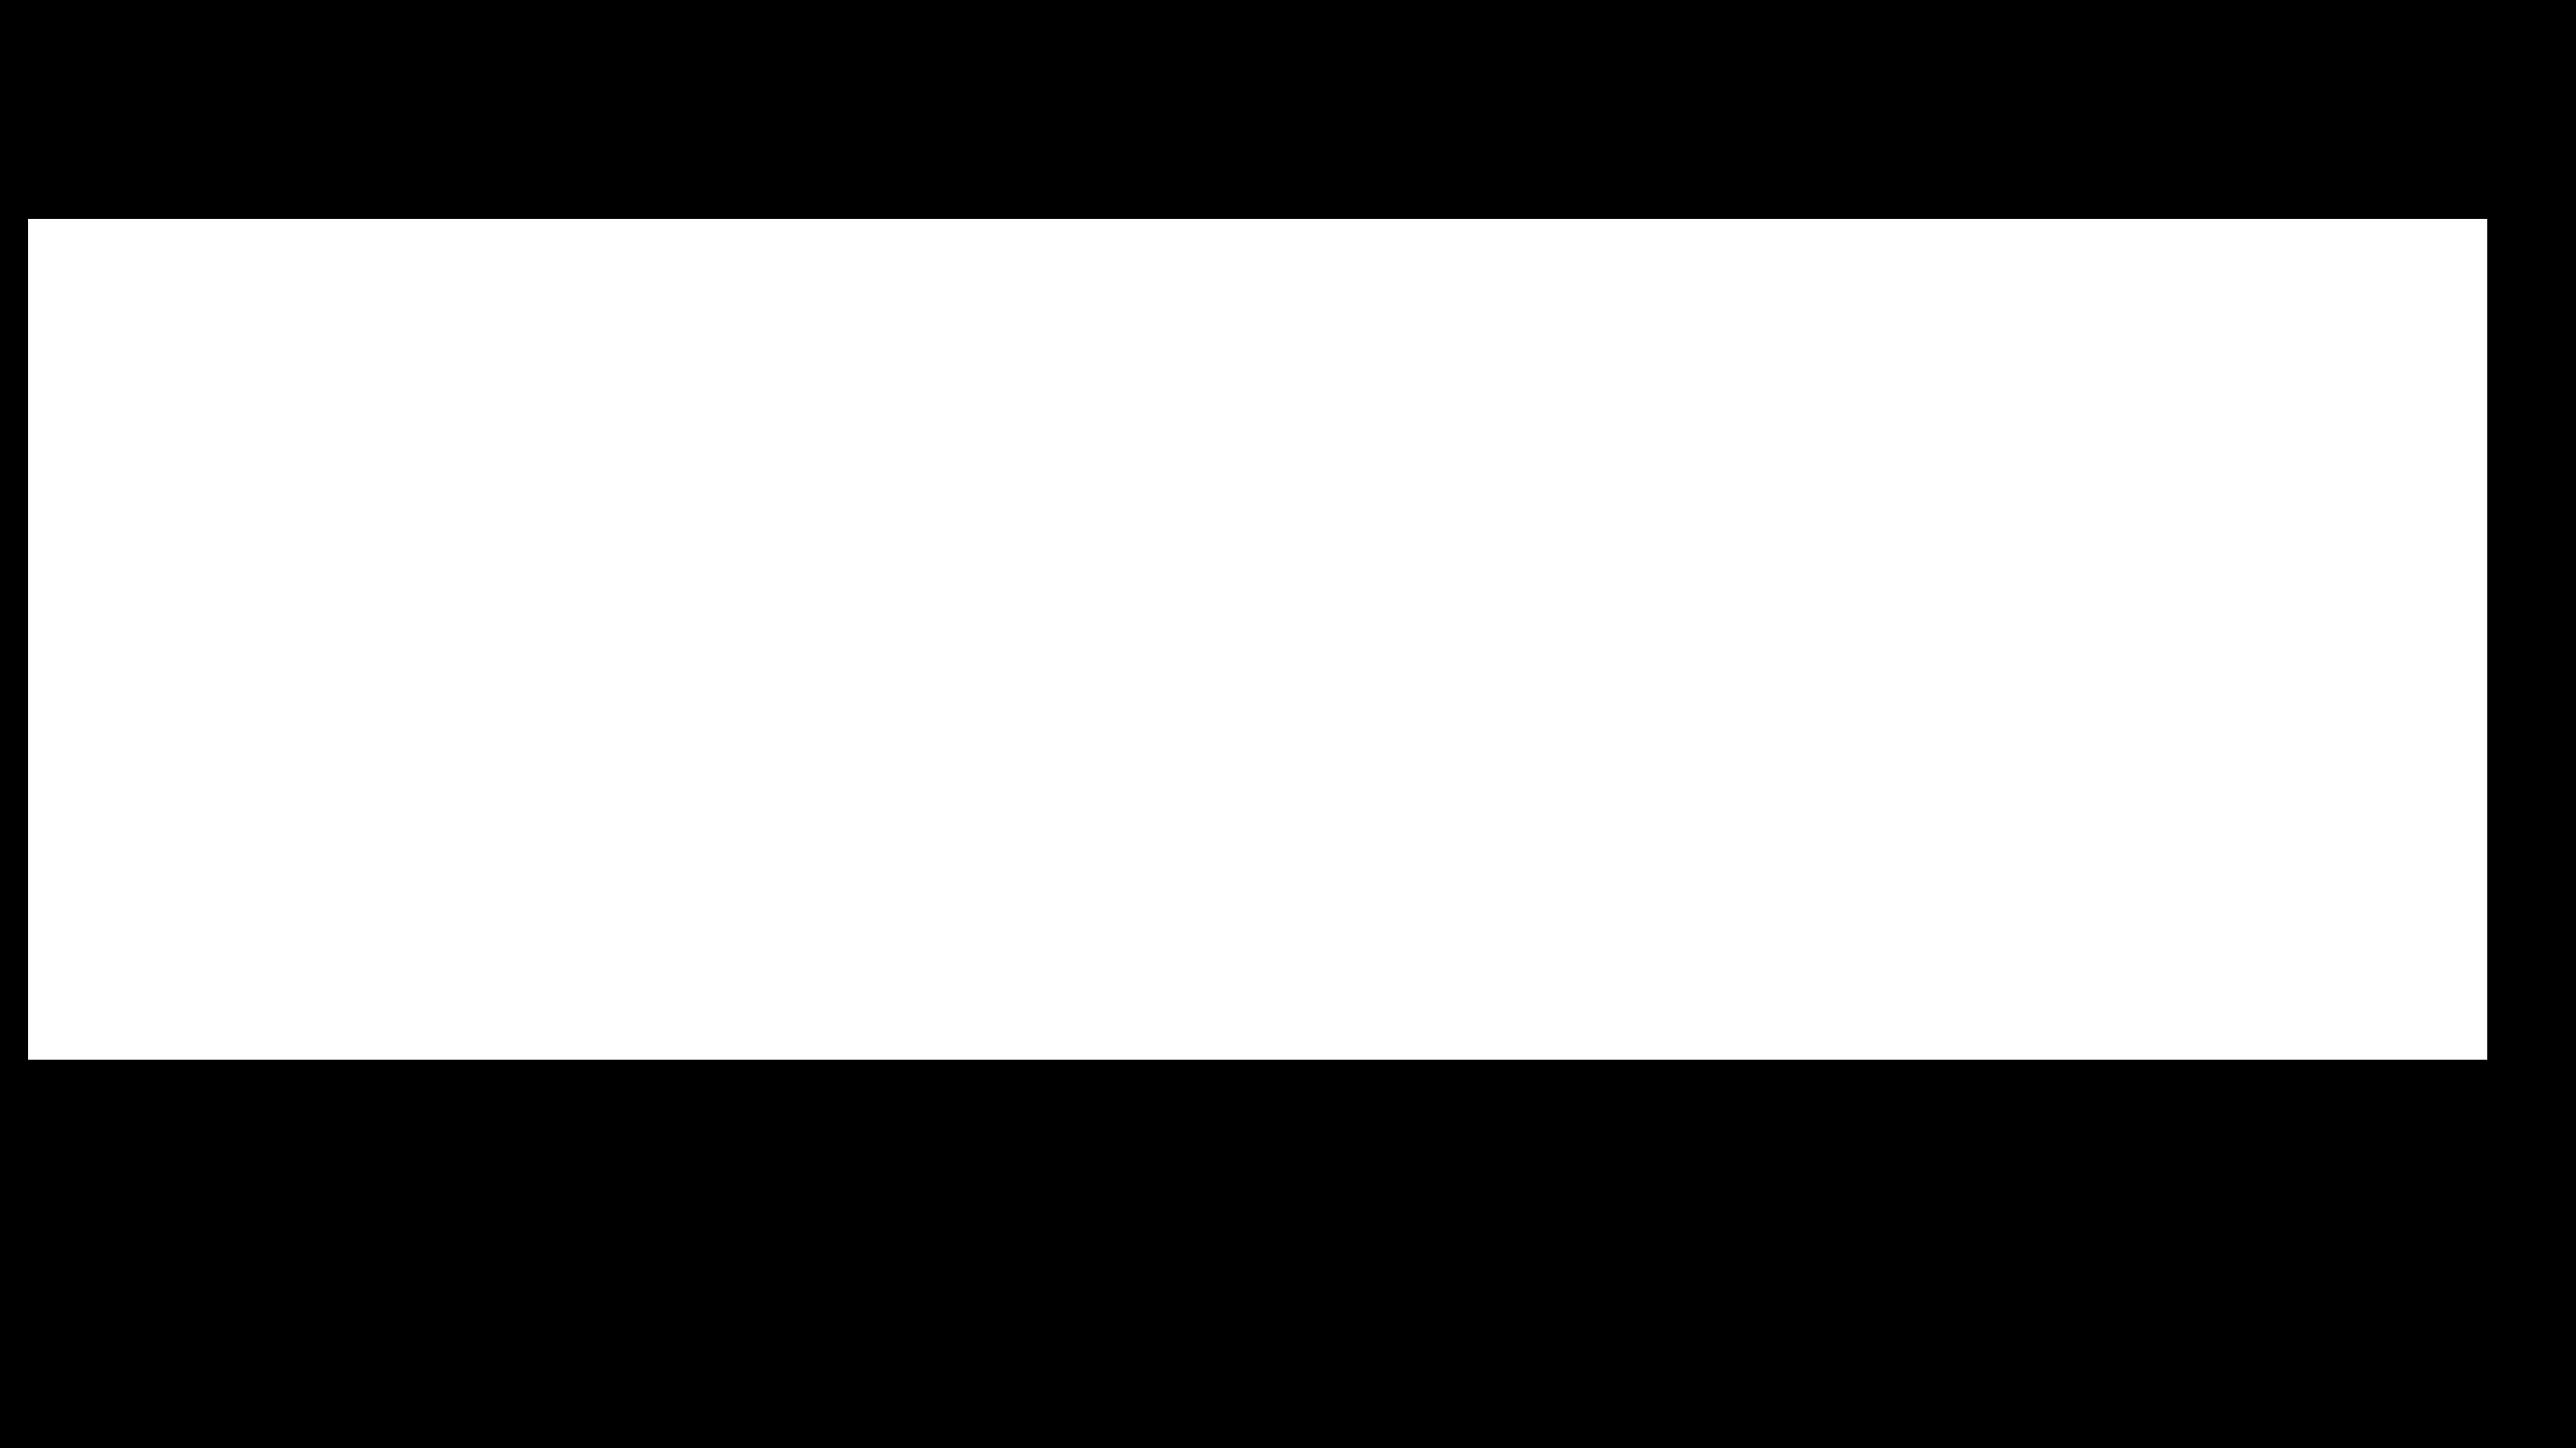 Kevin Hubble